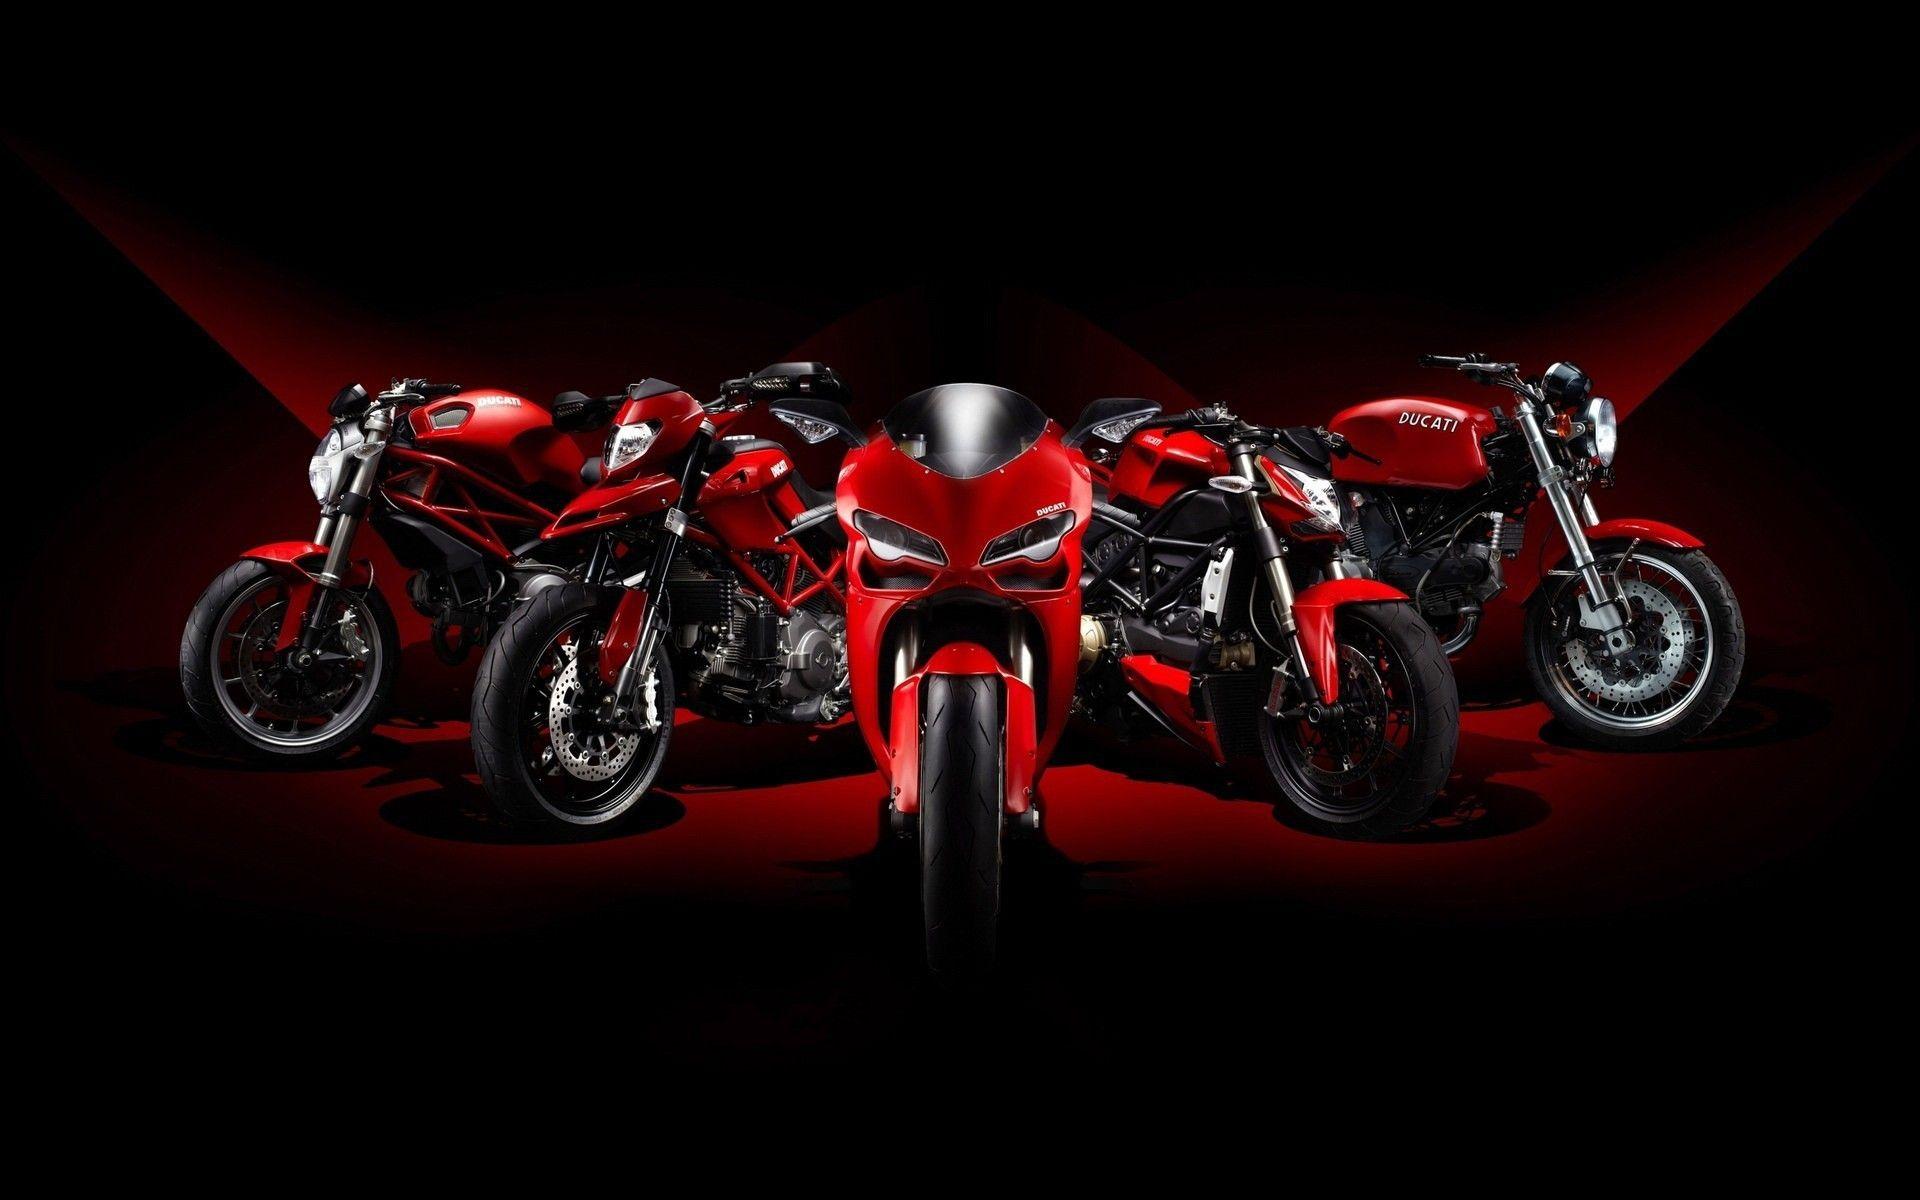 Ducati Black Background Motorbikes Vehicles 1920x1200 Black